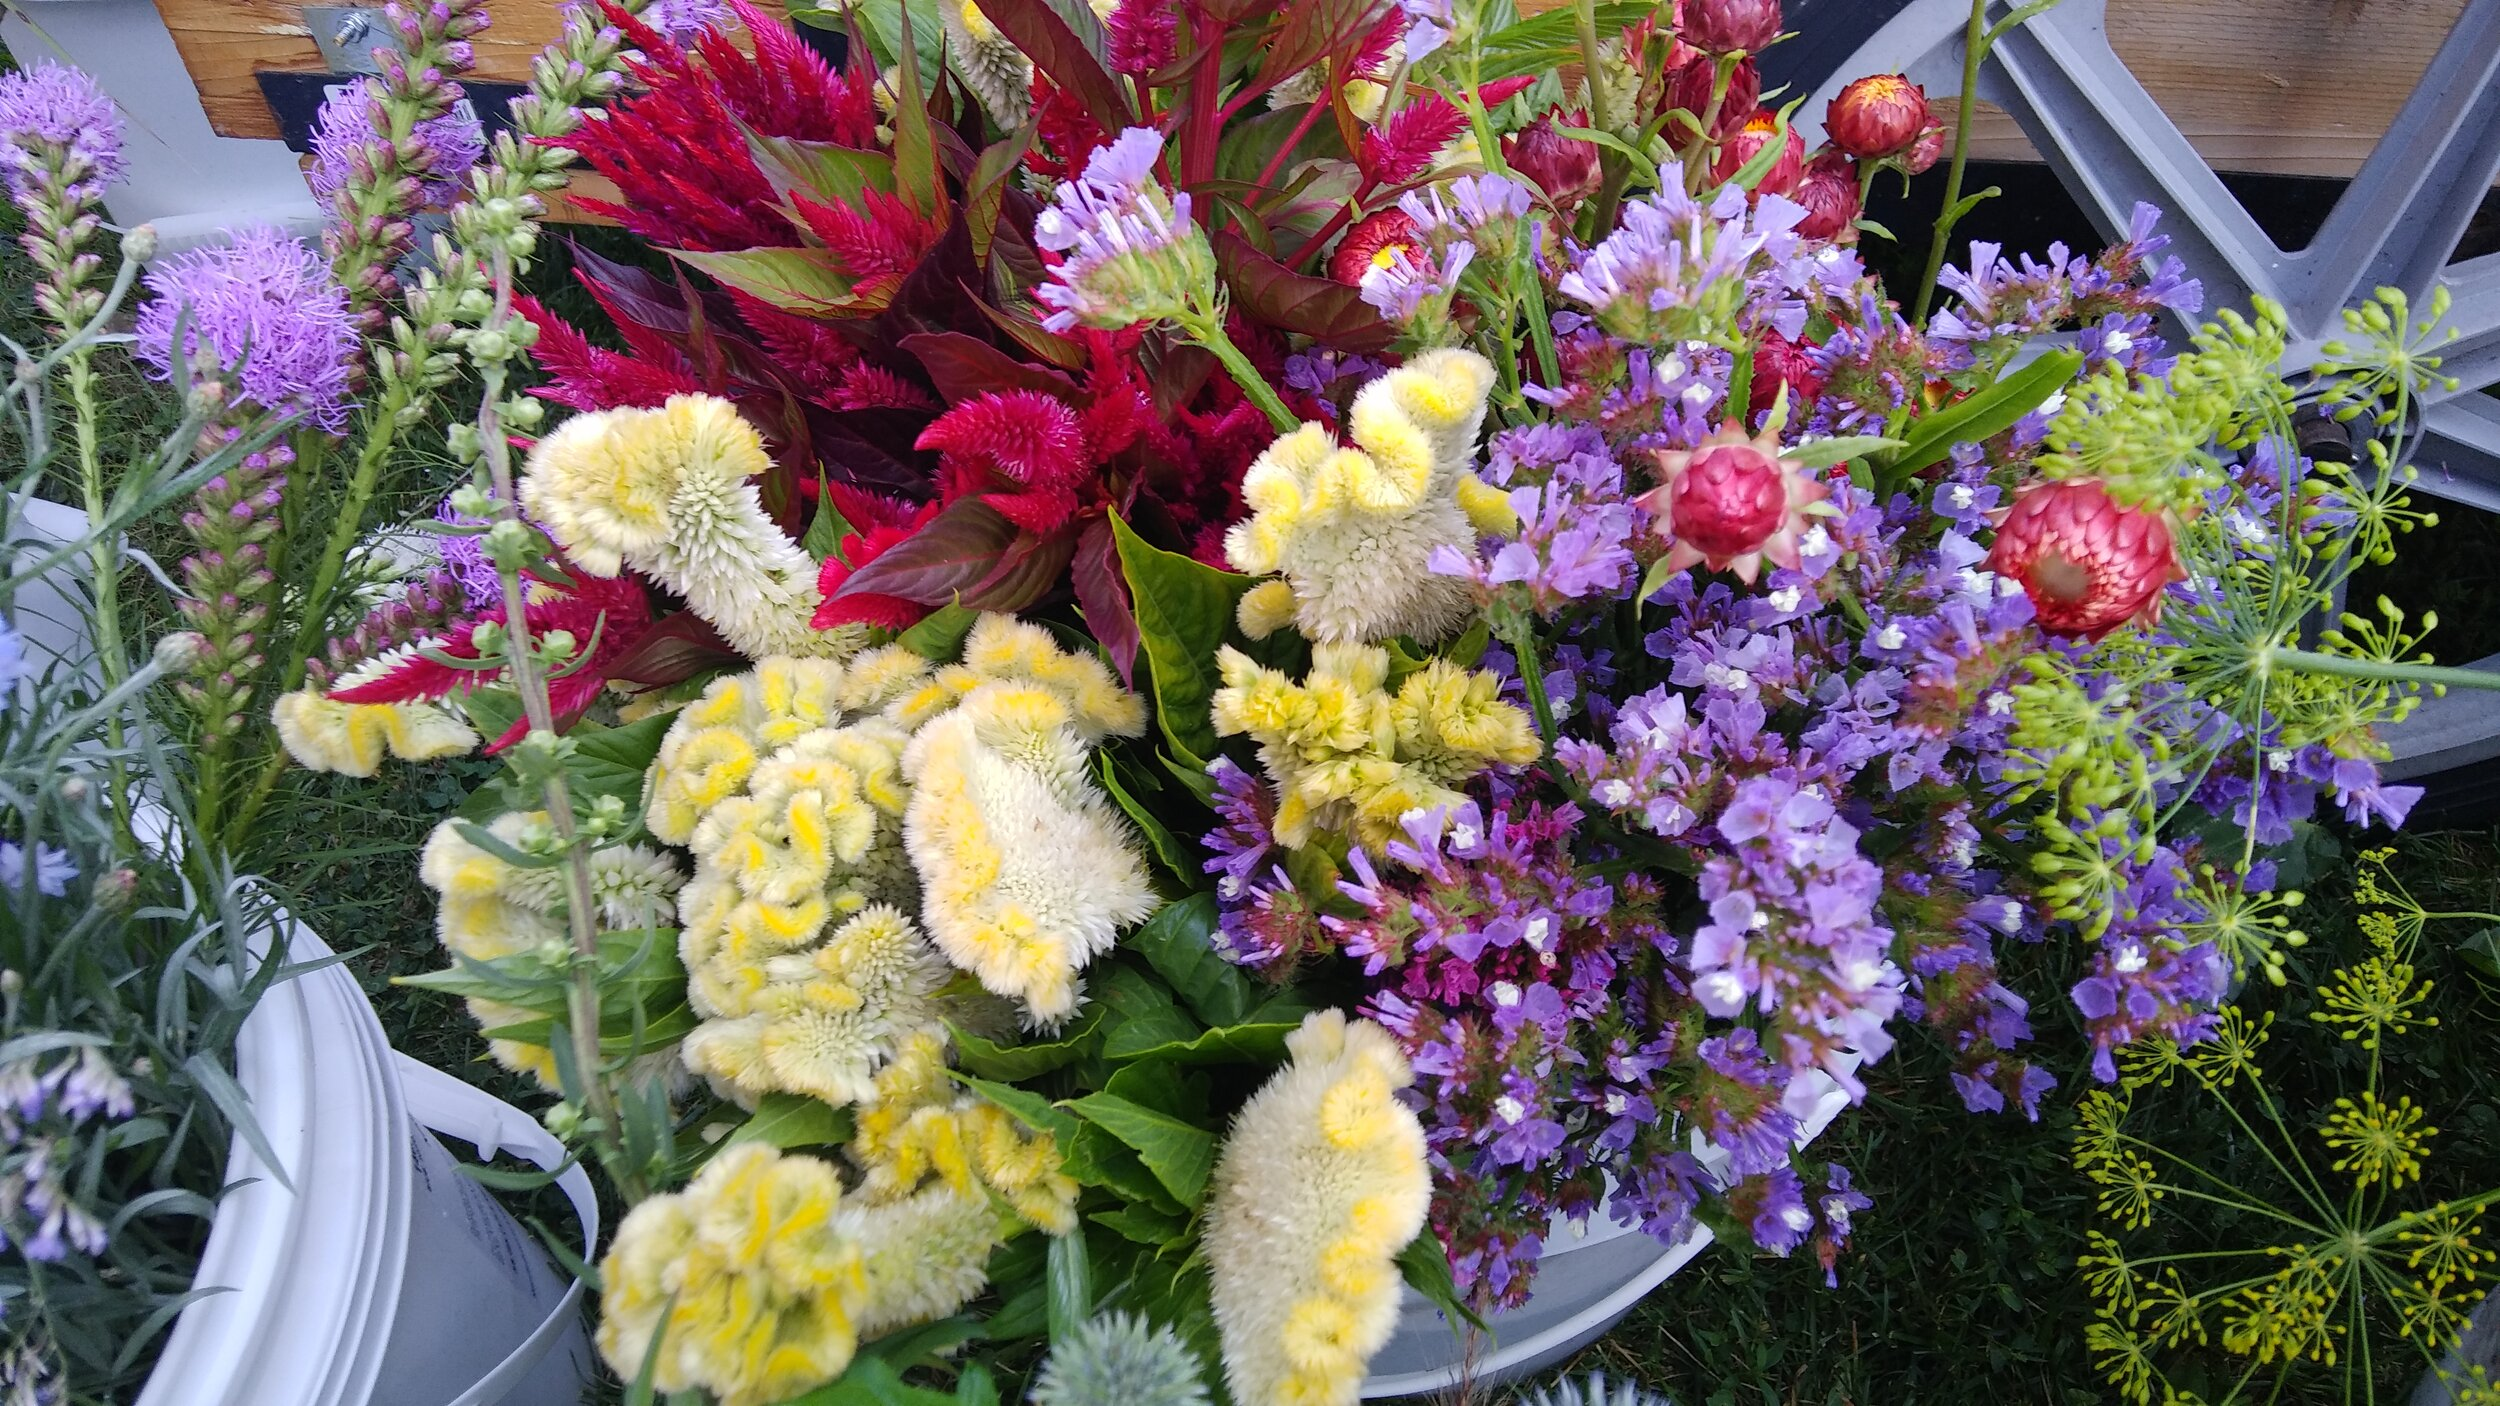 celosia stattice bucket of blooms.jpg